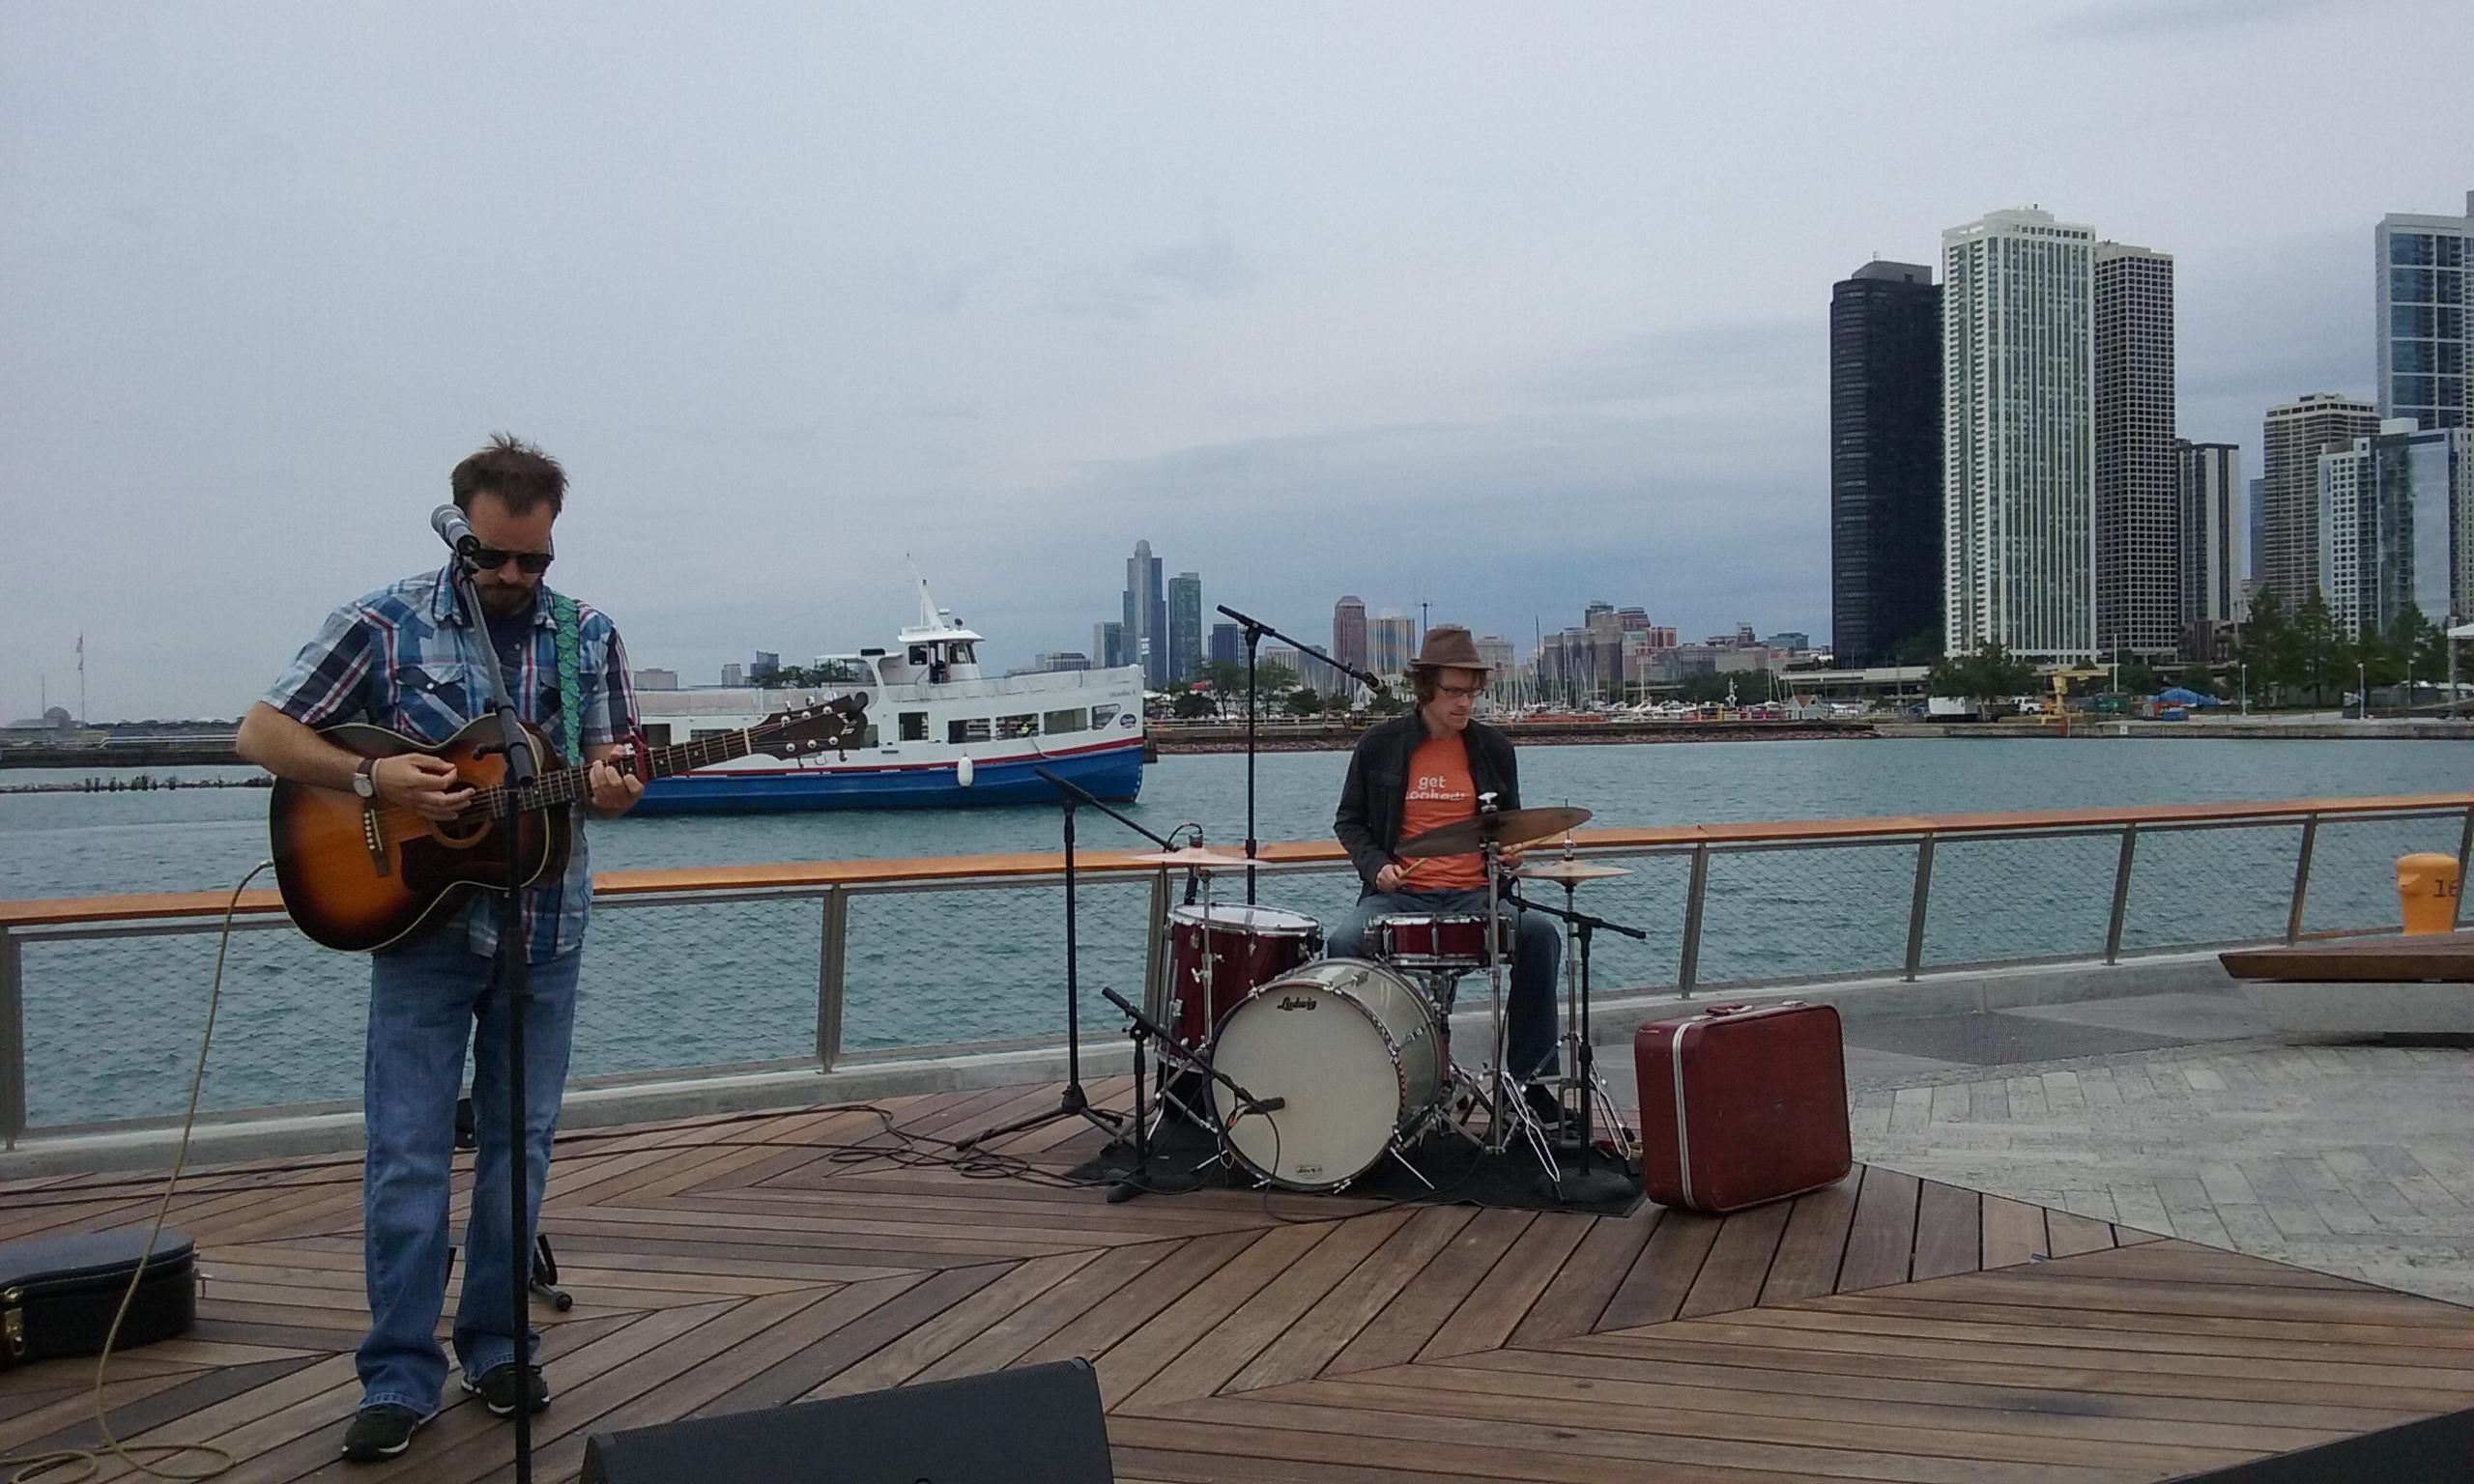 Navy Pier Performance